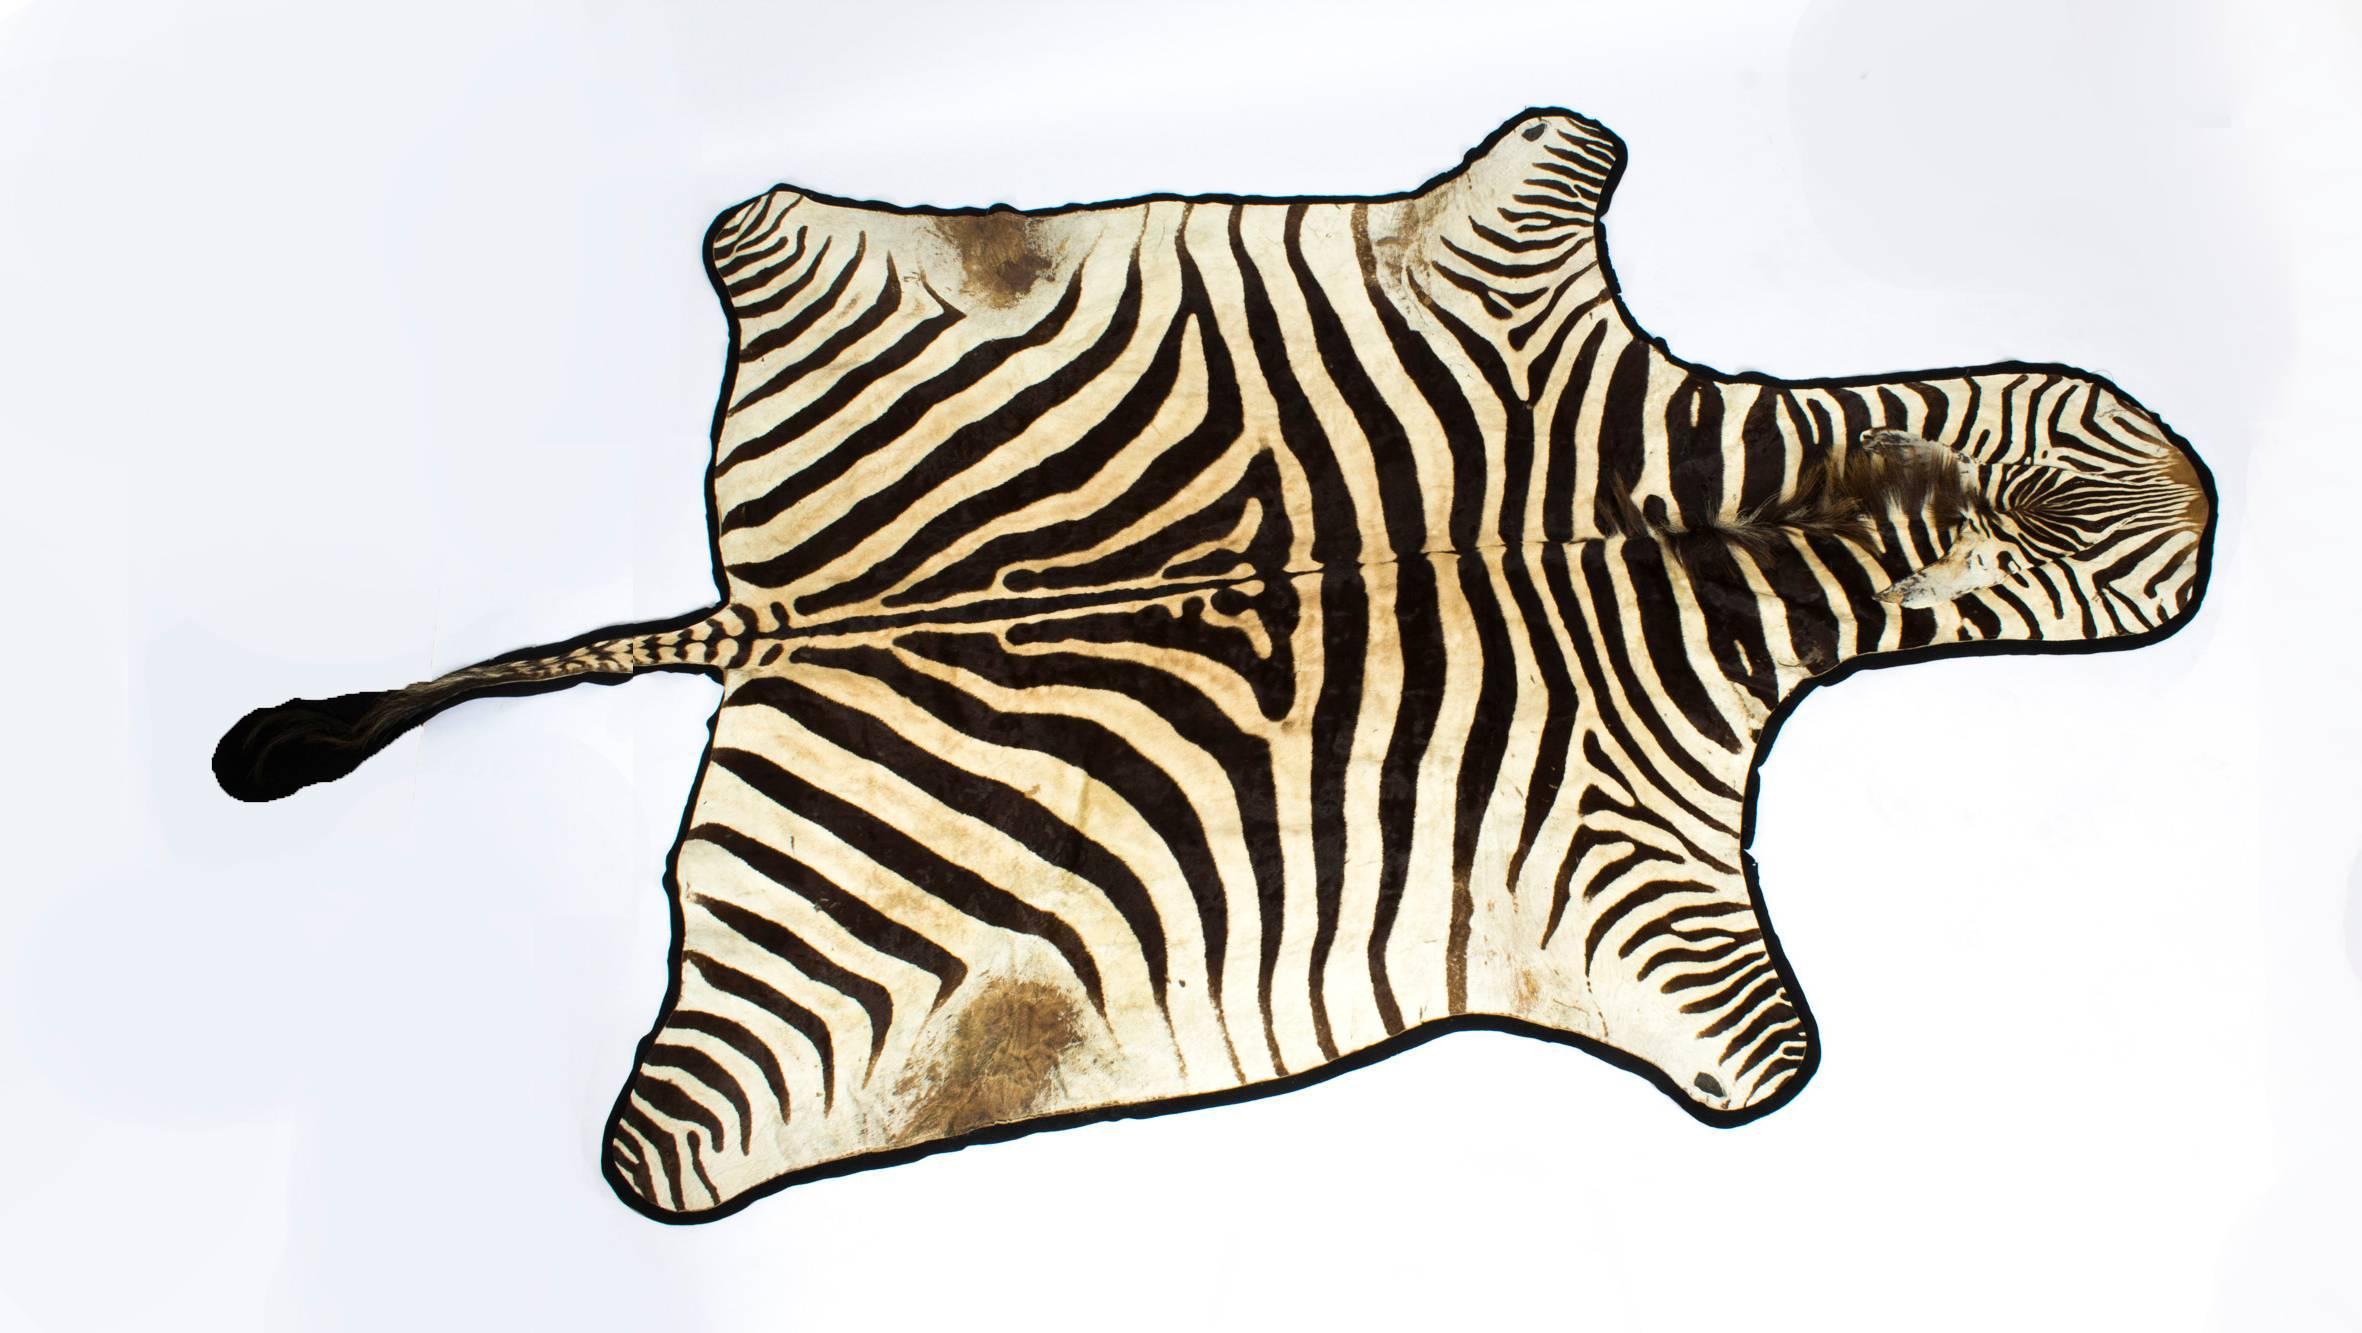 rug ethanallen us architecture zebra en flip book sand s alt lr drapery rugs ivory shop clearance